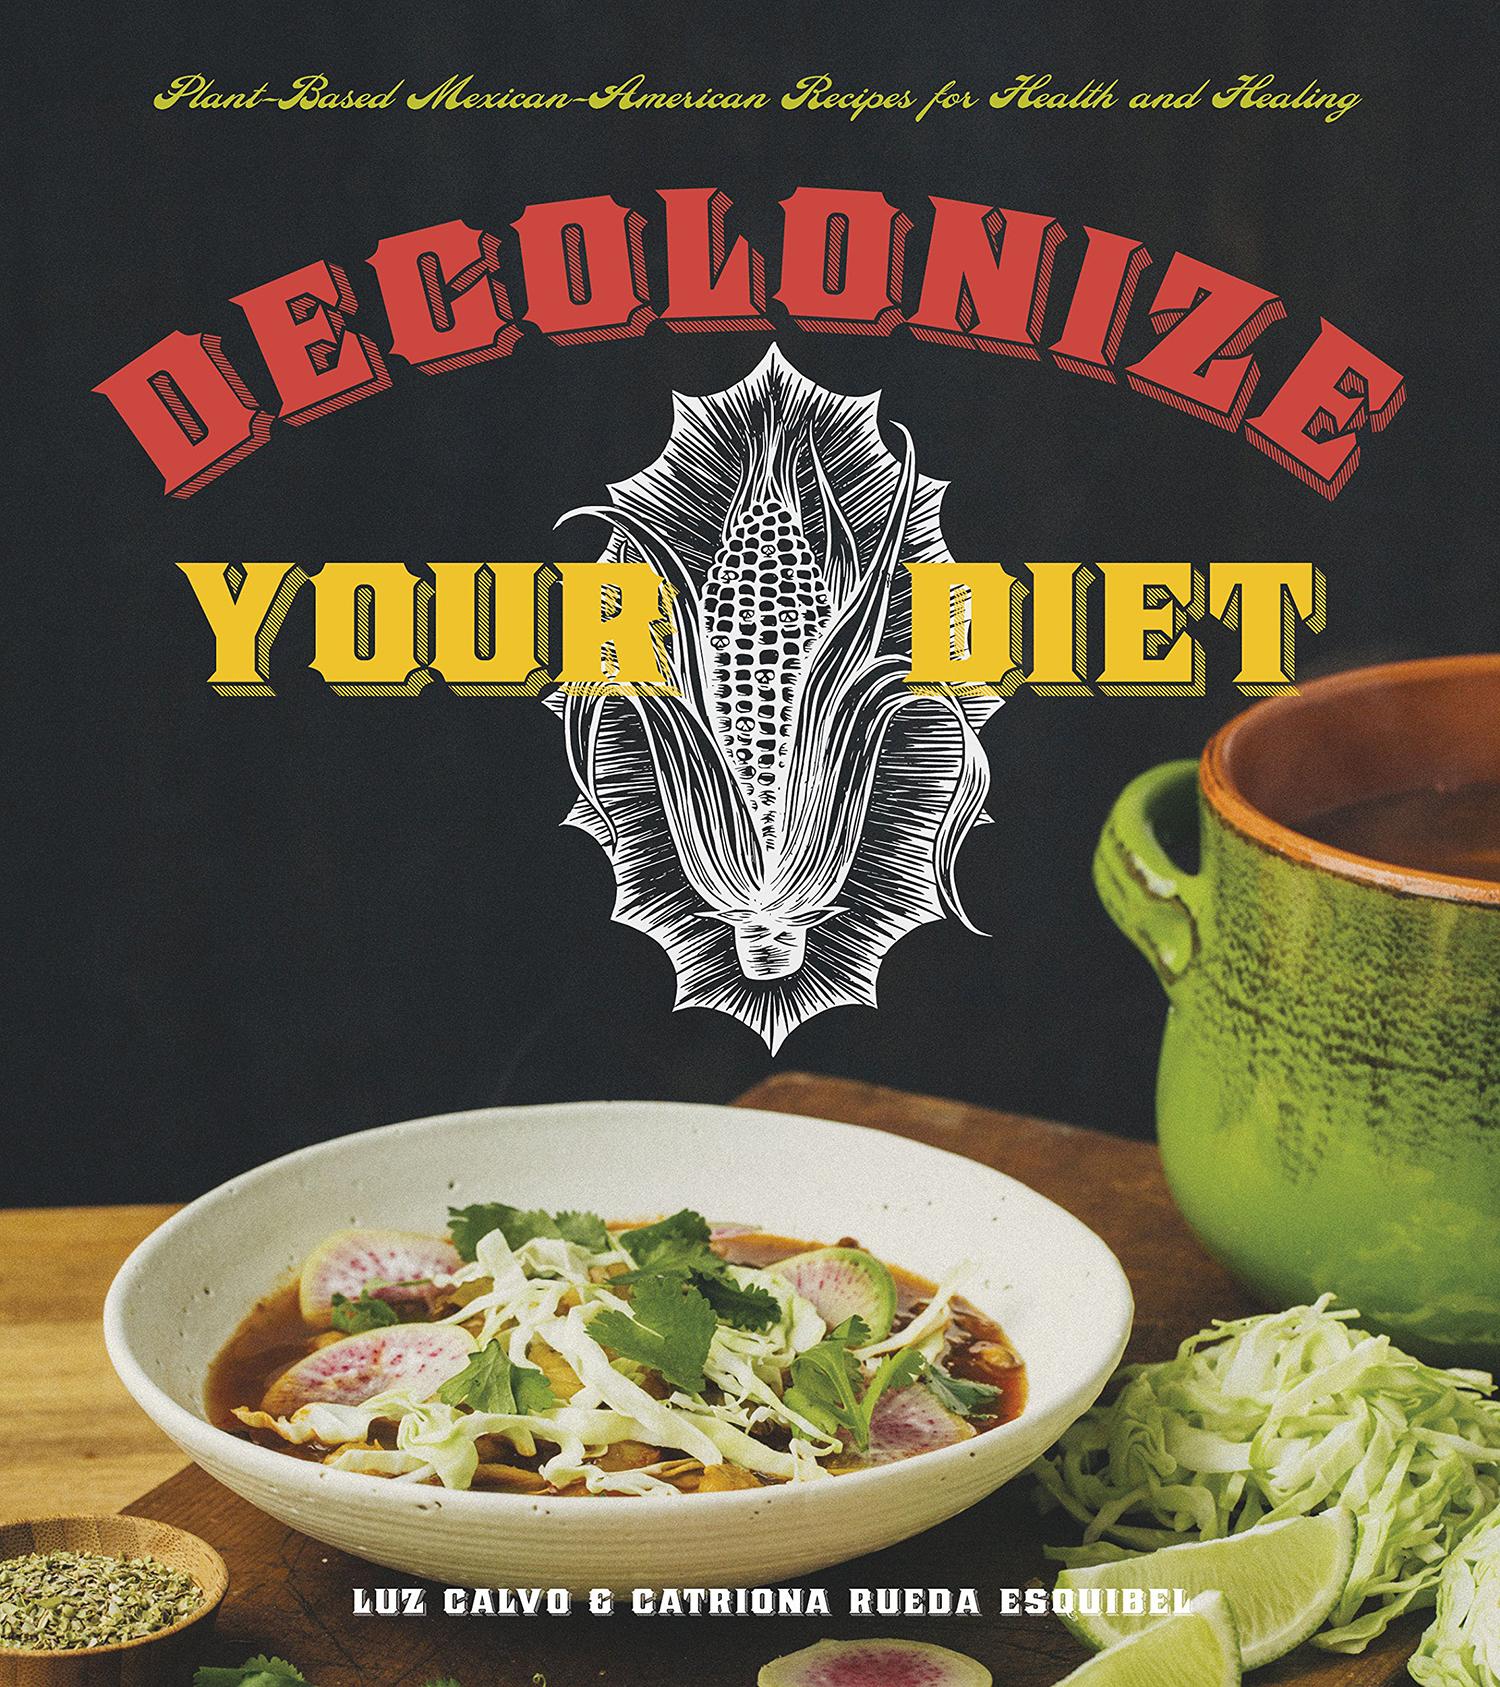 Decolonize Your Diet by Luz Calvo and Catriona Rueda Esquibel